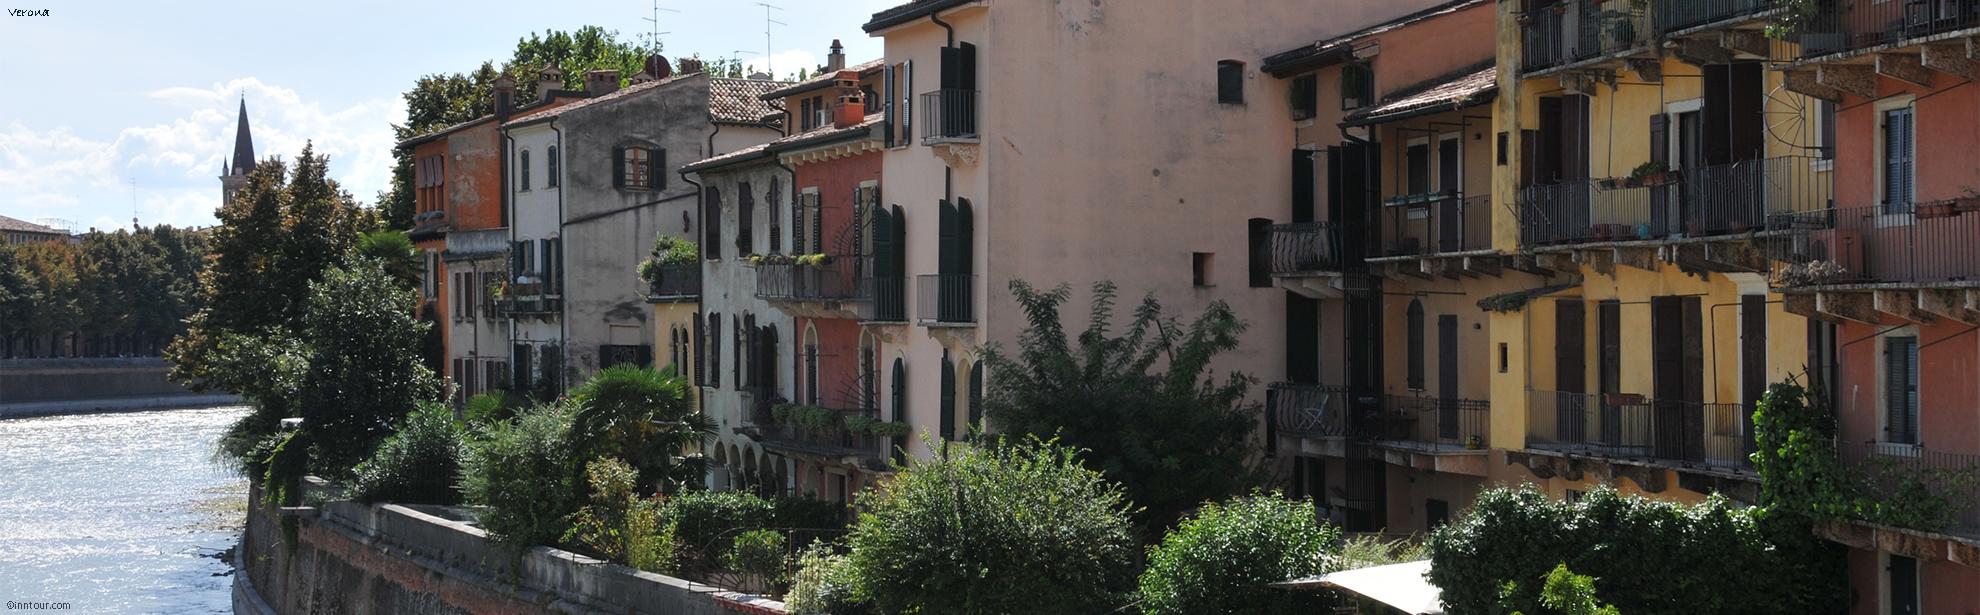 Oklassinntour_Verona_DSC_1005-2